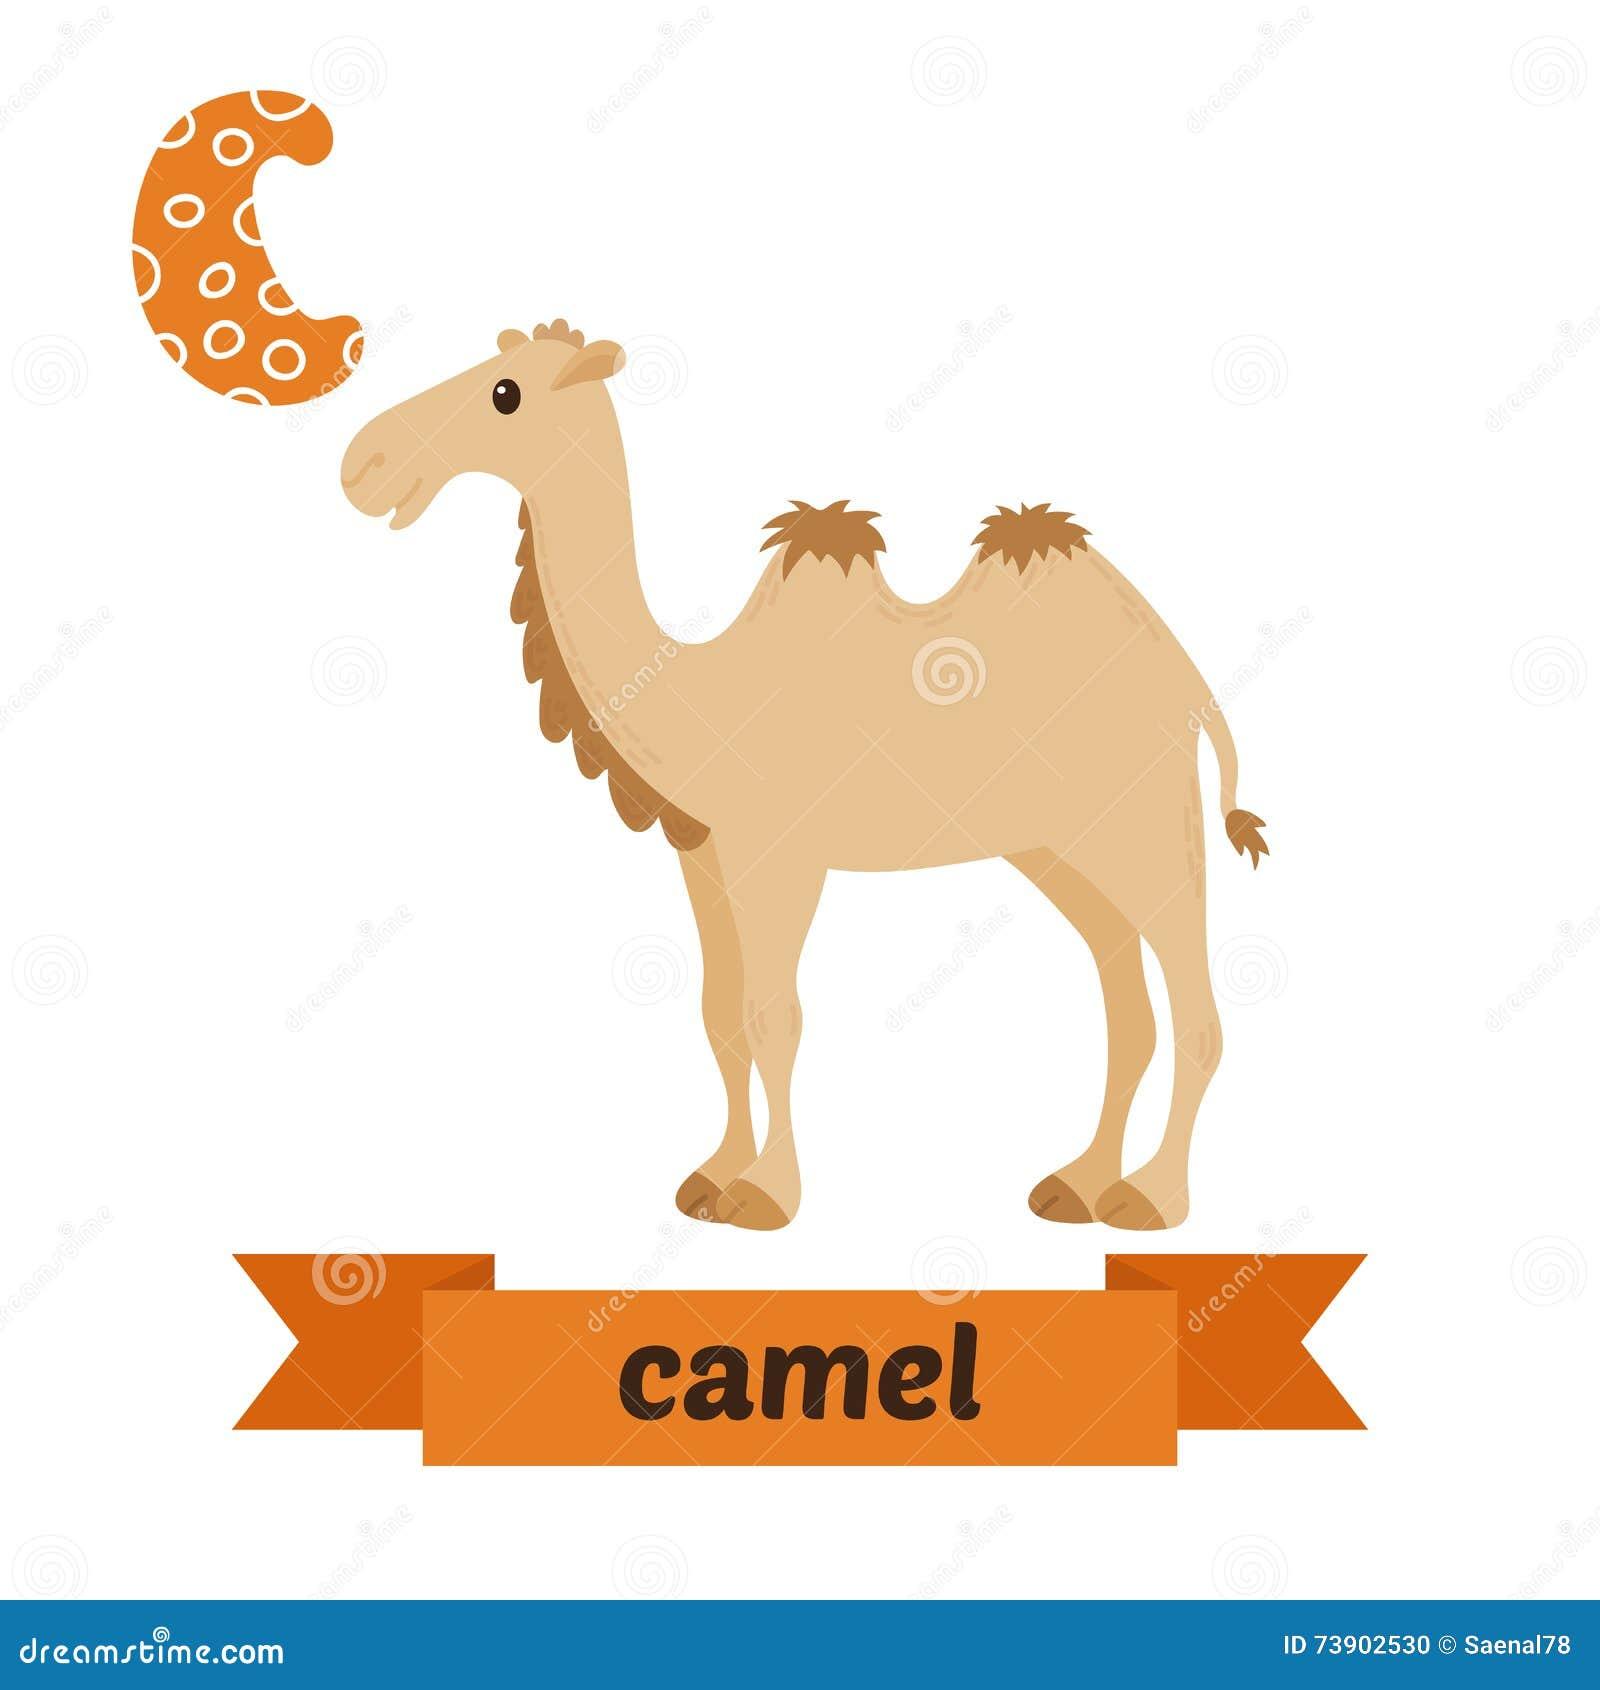 Stock Illustration Camel C Letter Cute Children Animal Alphabet Vector Funny Cartoon Animals Illustration Image73902530 on Desert Art For Preschool